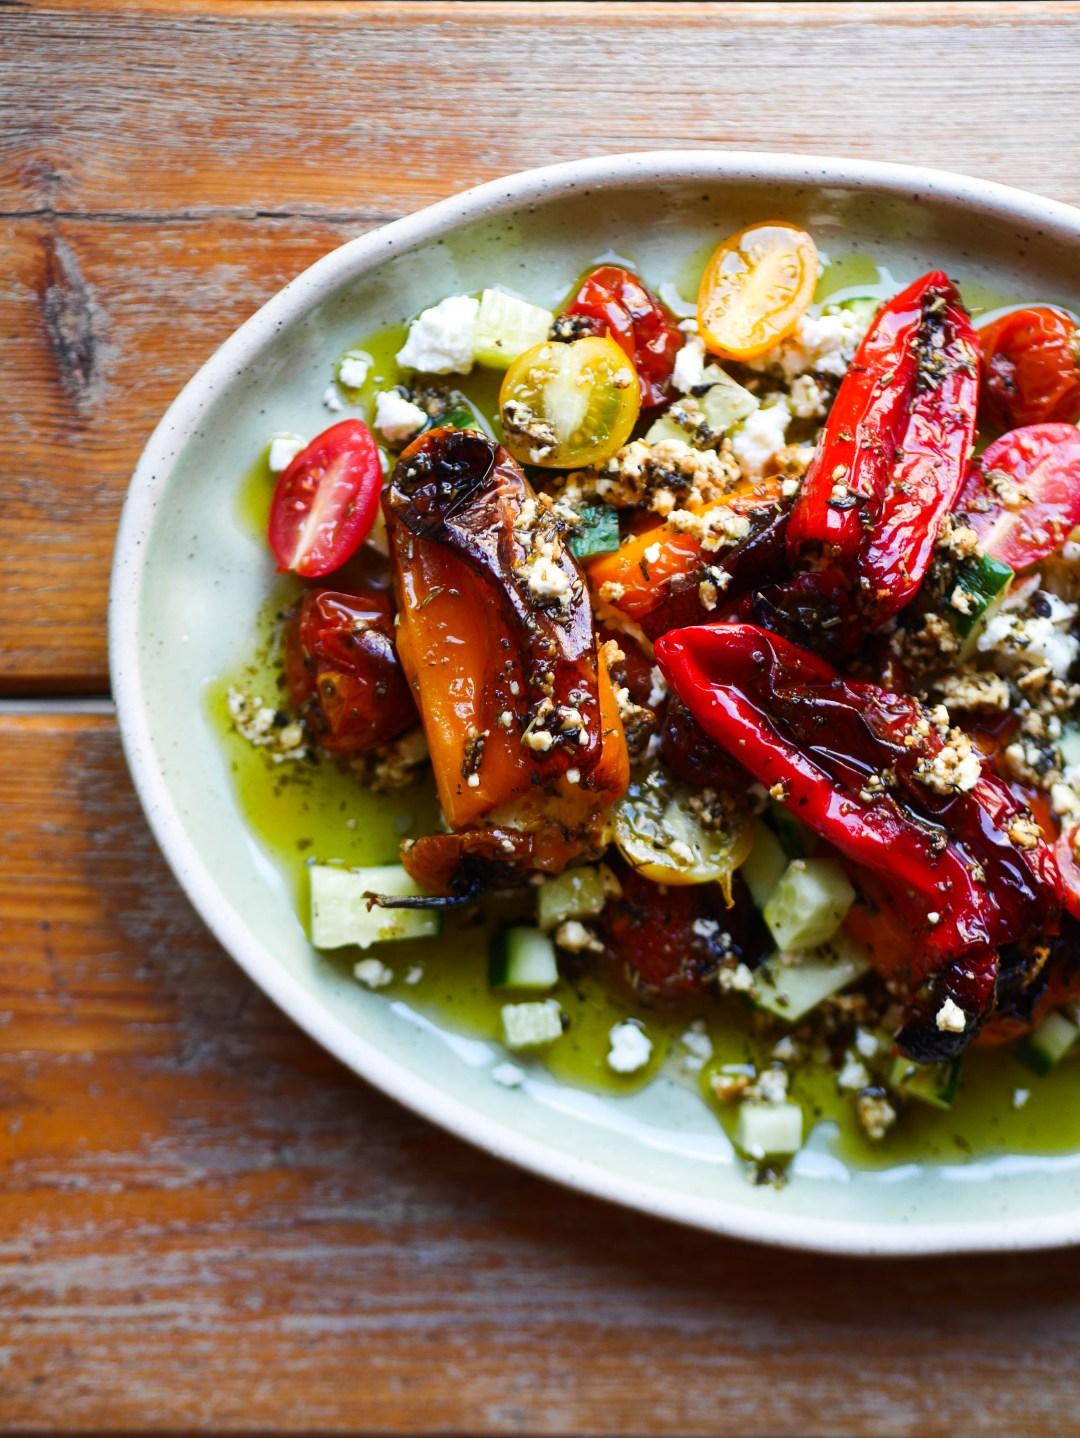 food-blog-culinaire-woodmoodfood-recette-poivrons-farcis-feta-facile-2